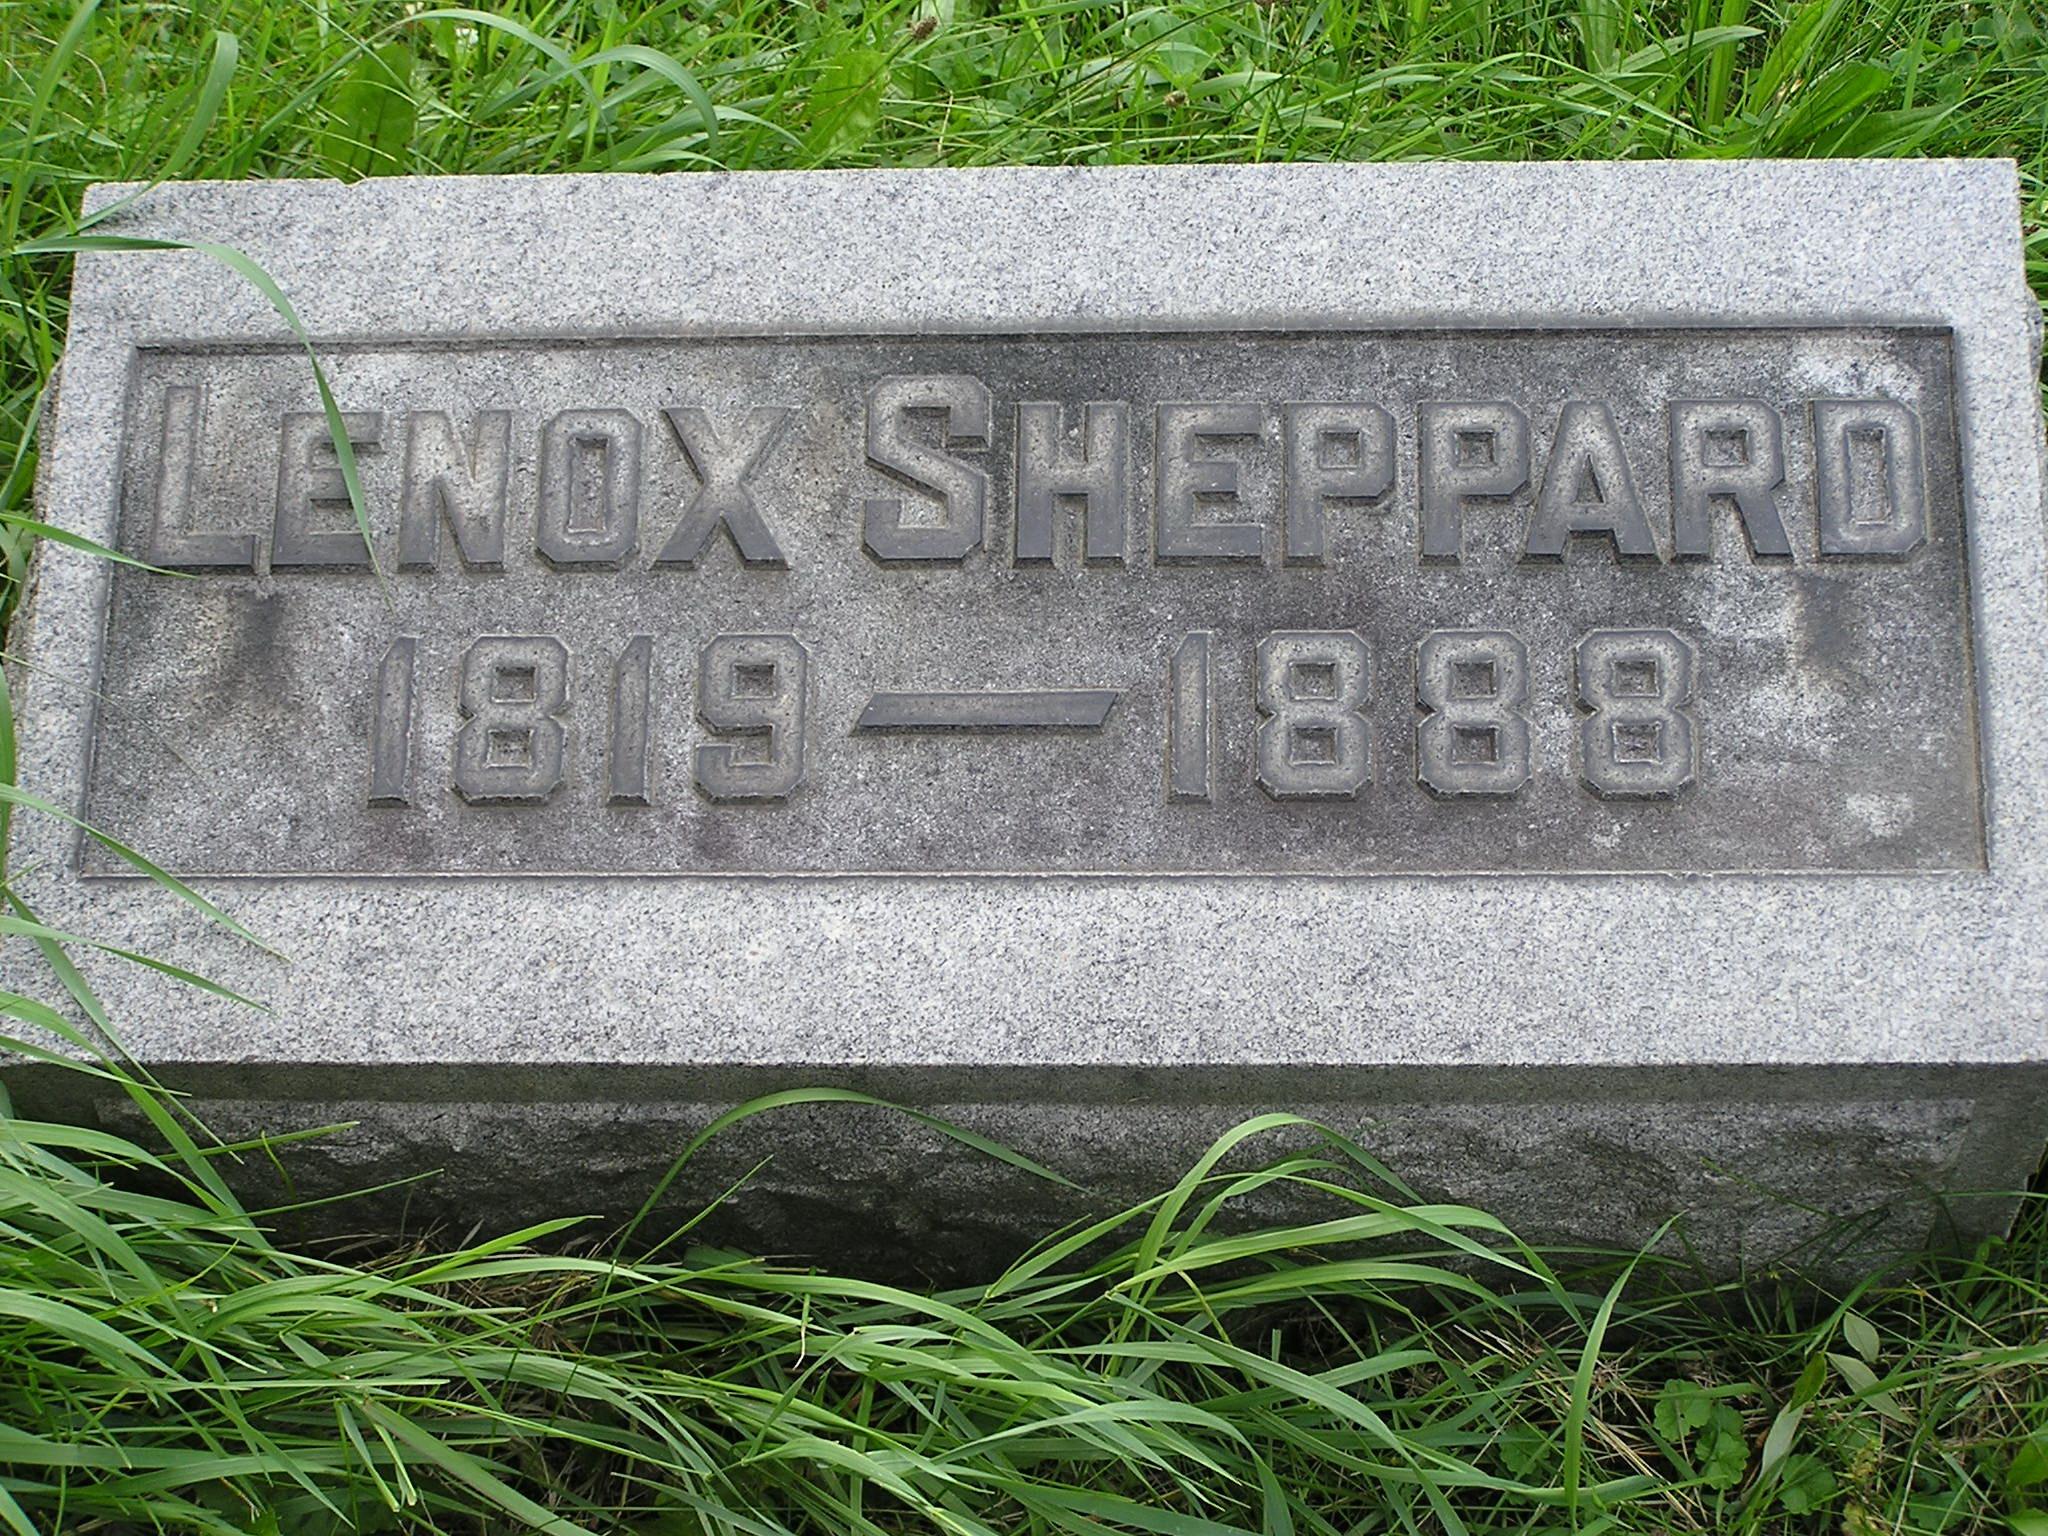 Henry Lenox Sheppard